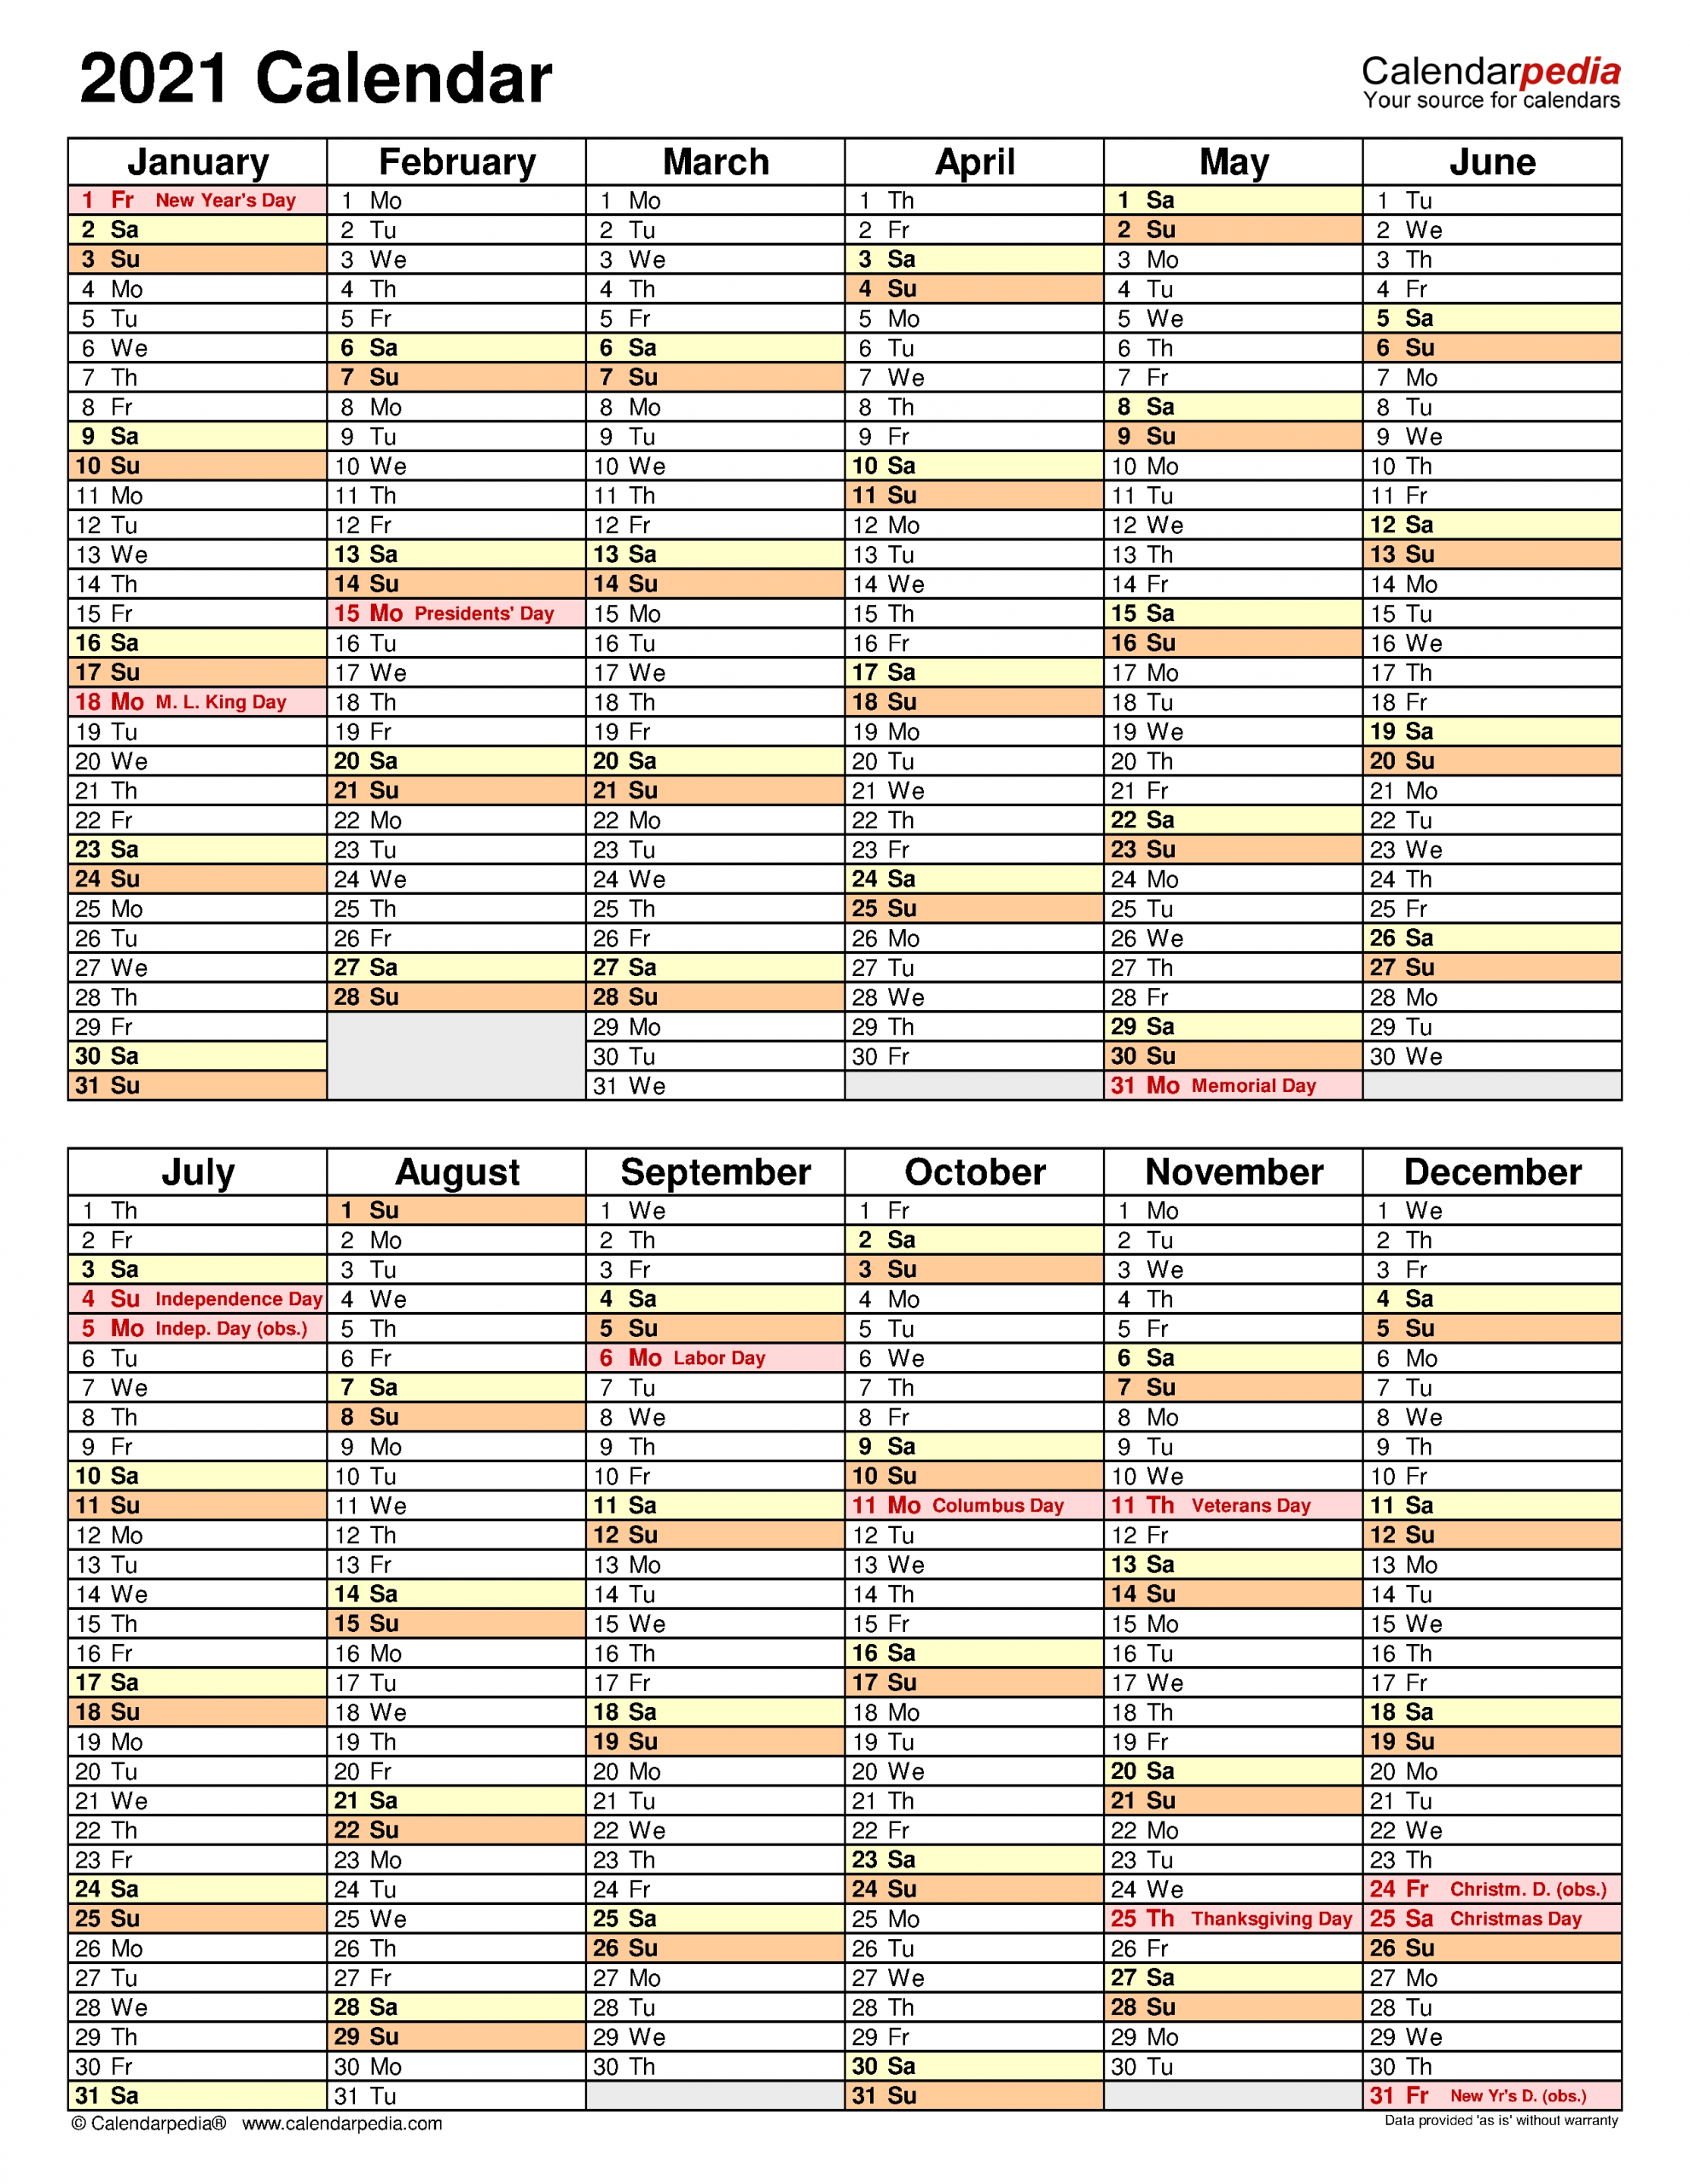 2021 Calendar - Free Printable Excel Templates - Calendarpedia pertaining to Calendar Template 2021 Indesign Image